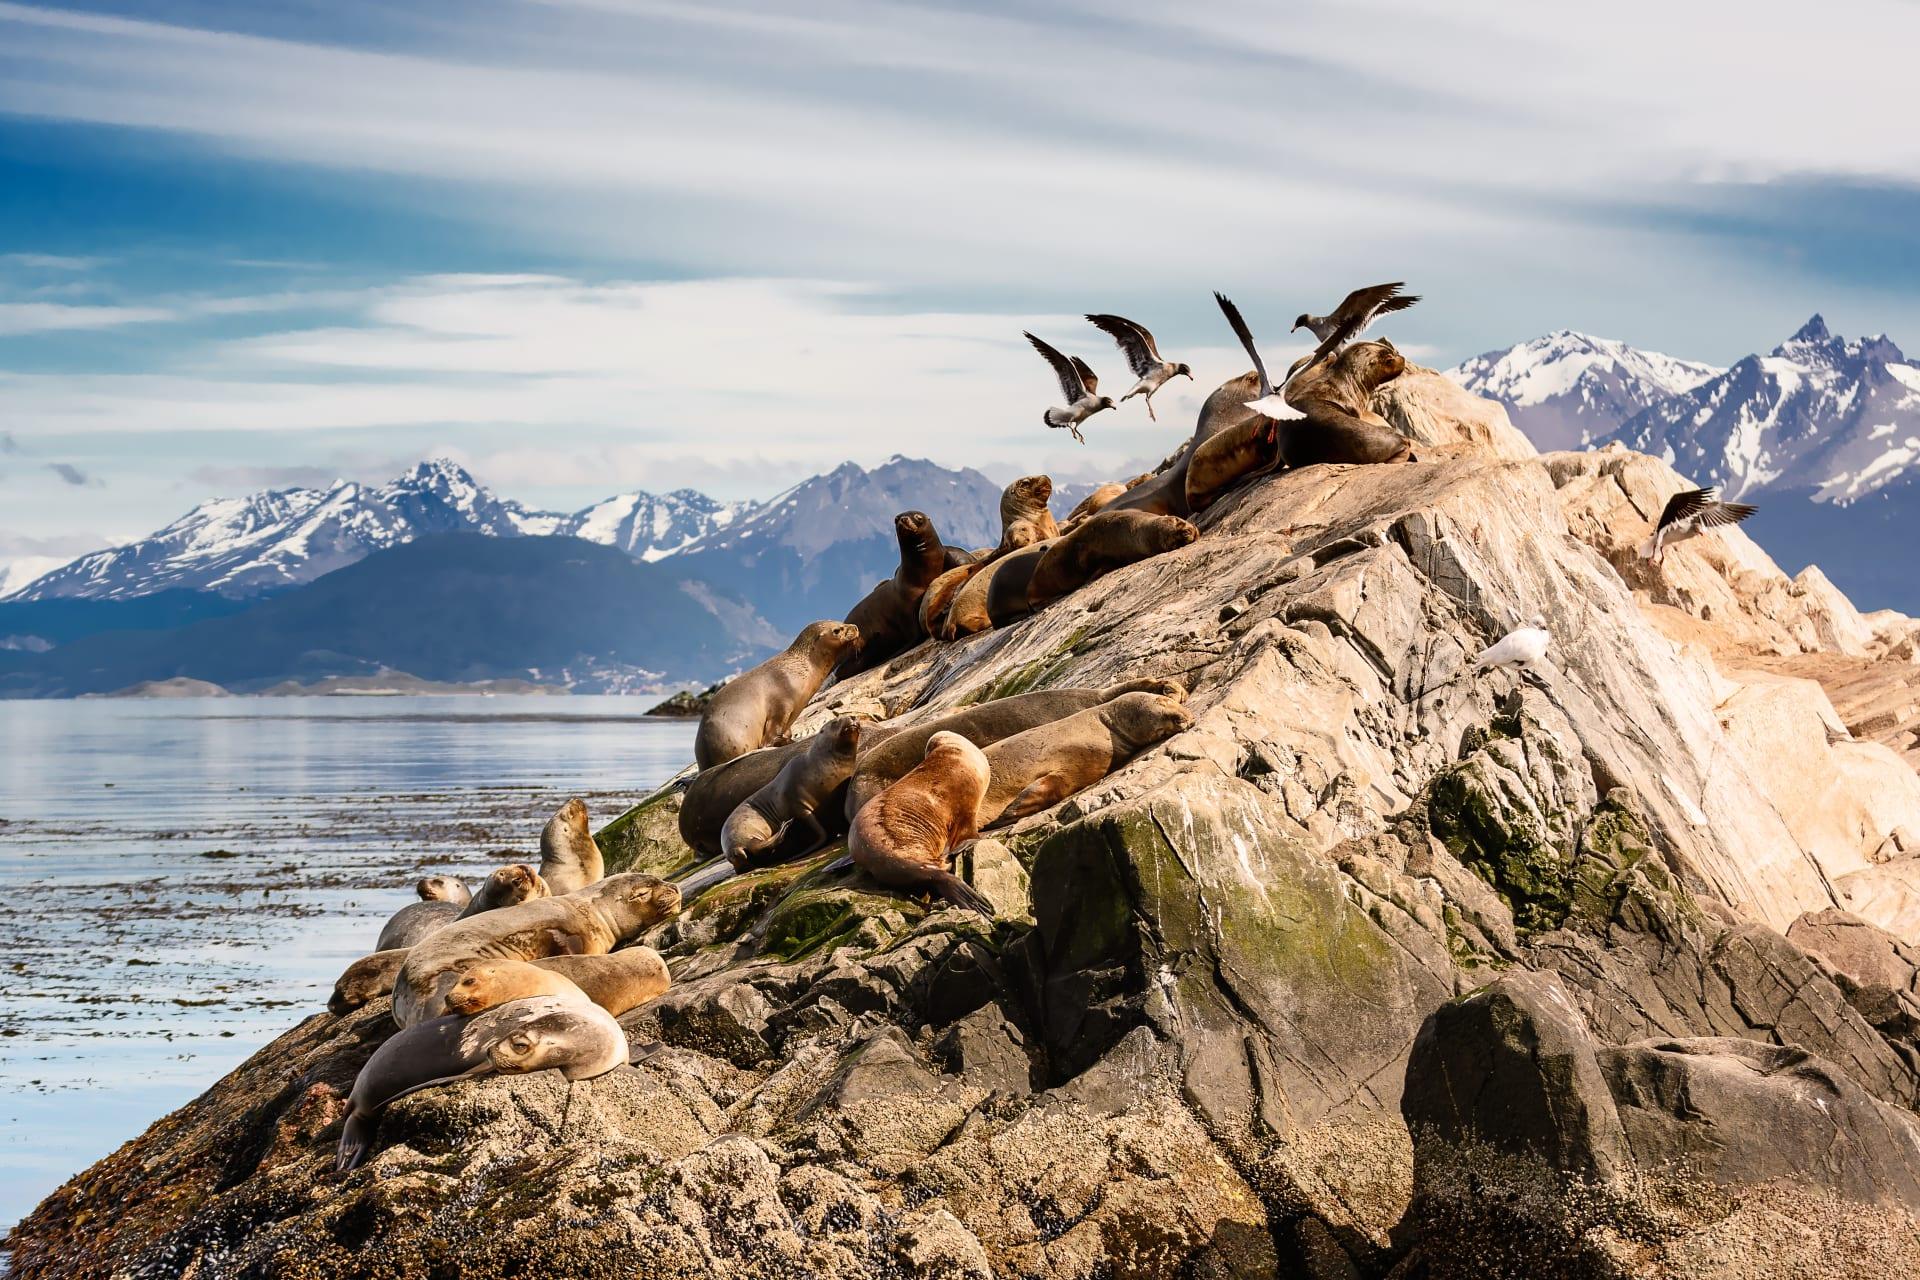 Ushuaia - Navigating the Beagle Channel